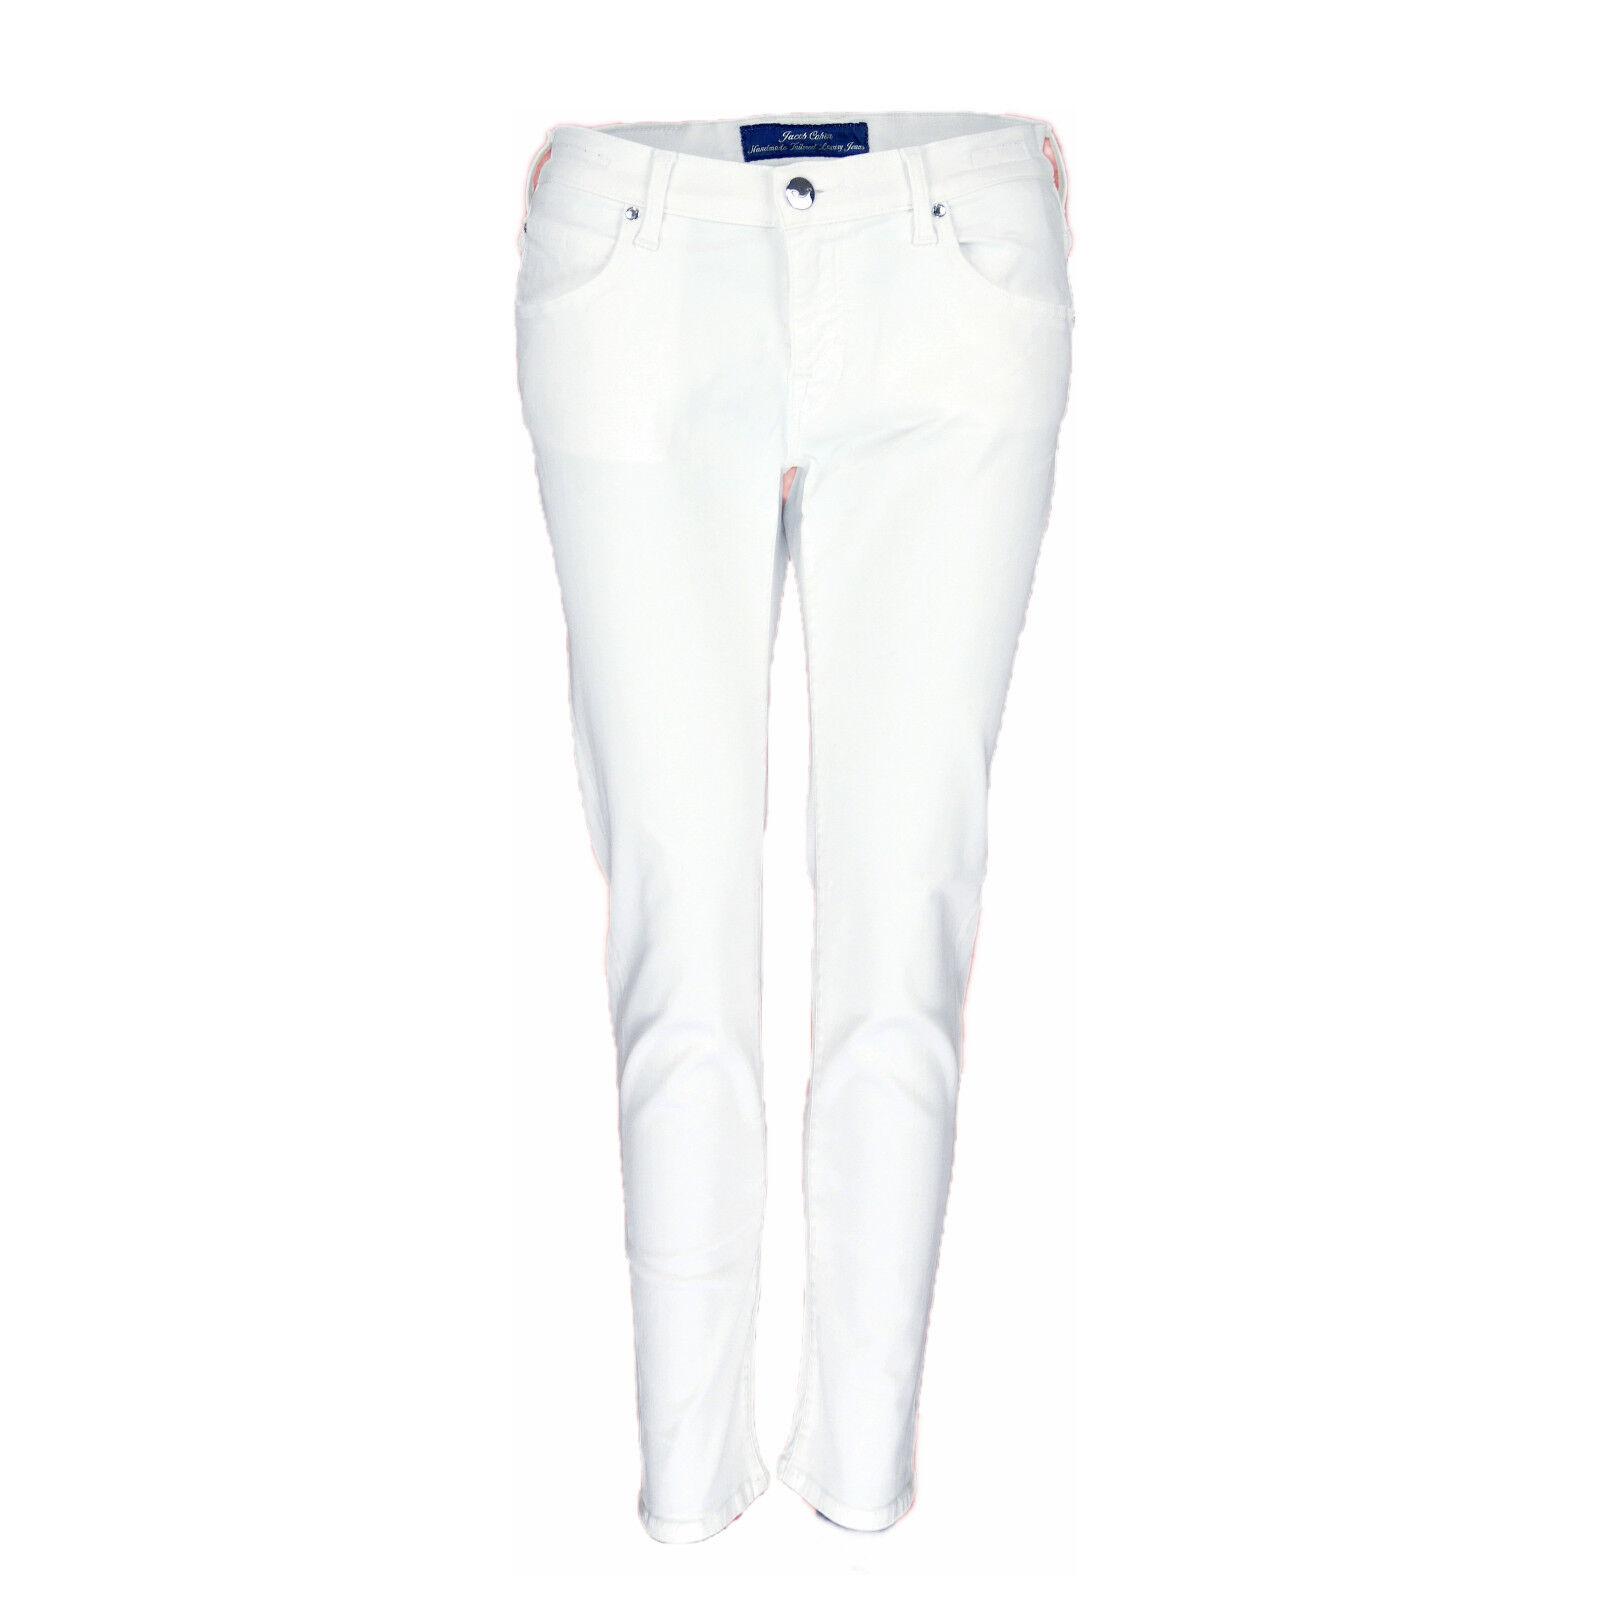 Jacob Cohen Jeans Damen Weiß Modell  Karen  (ehem. )